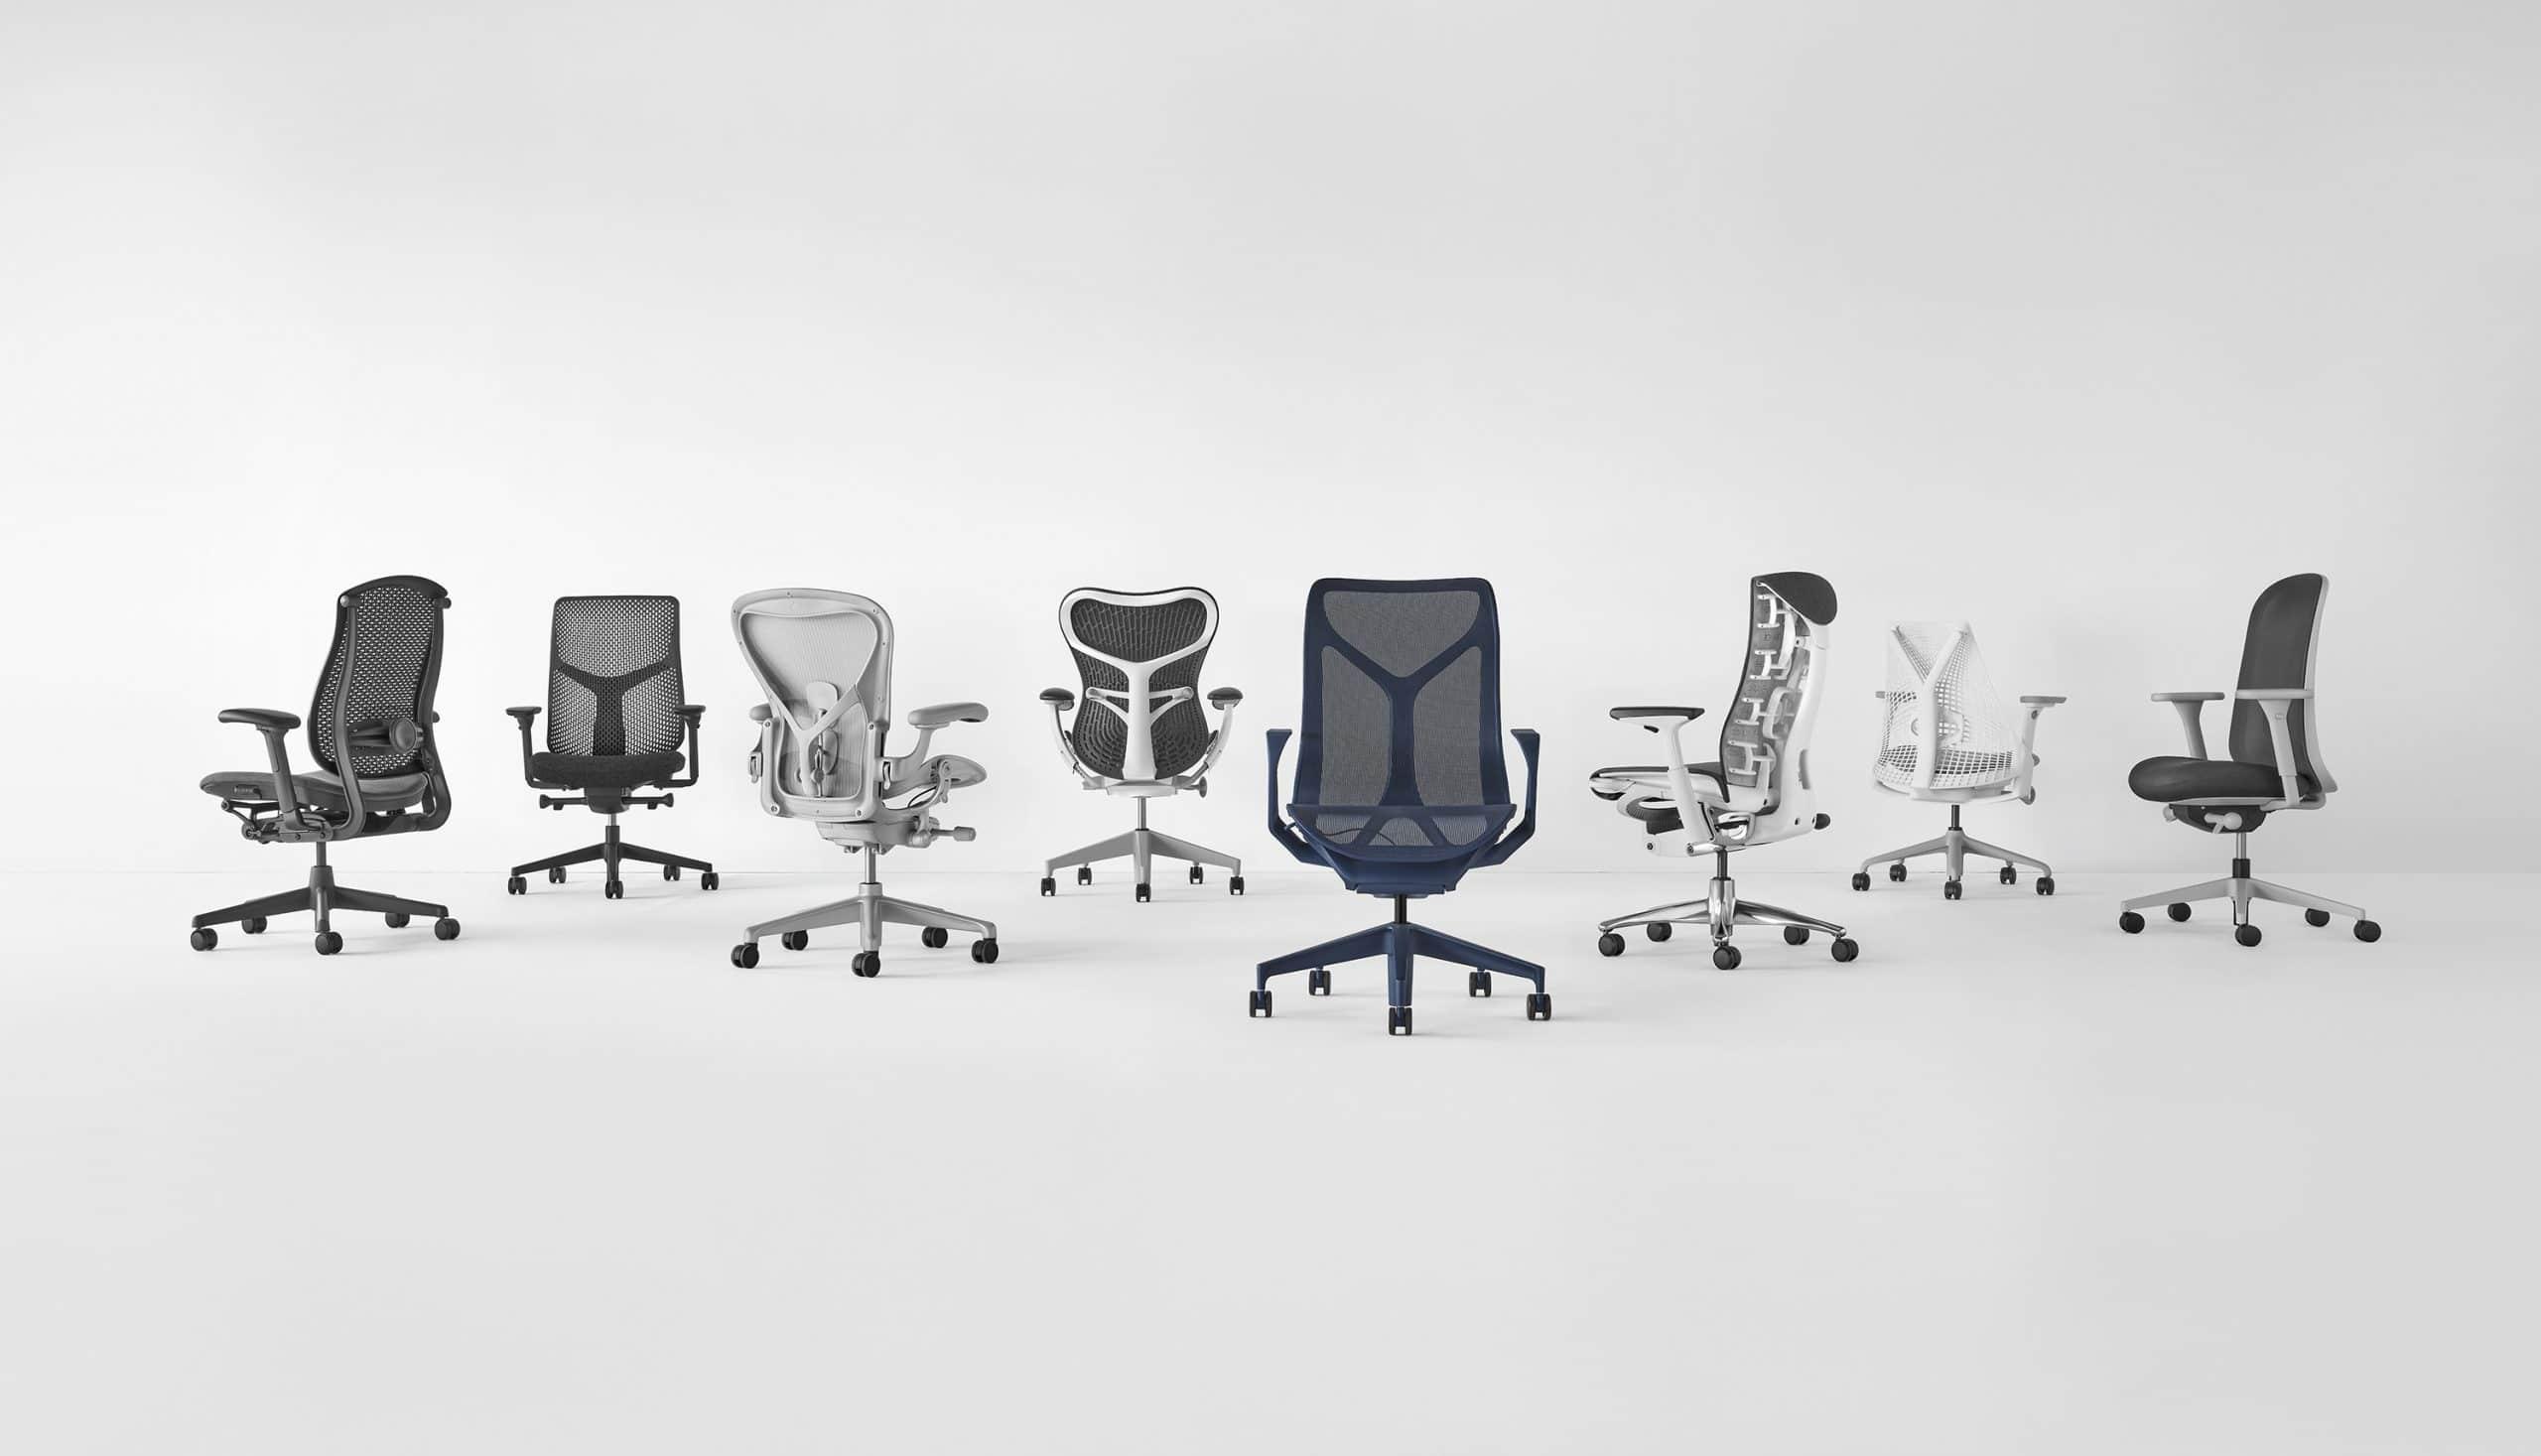 modelos de cadeira para escritório Herman Miller